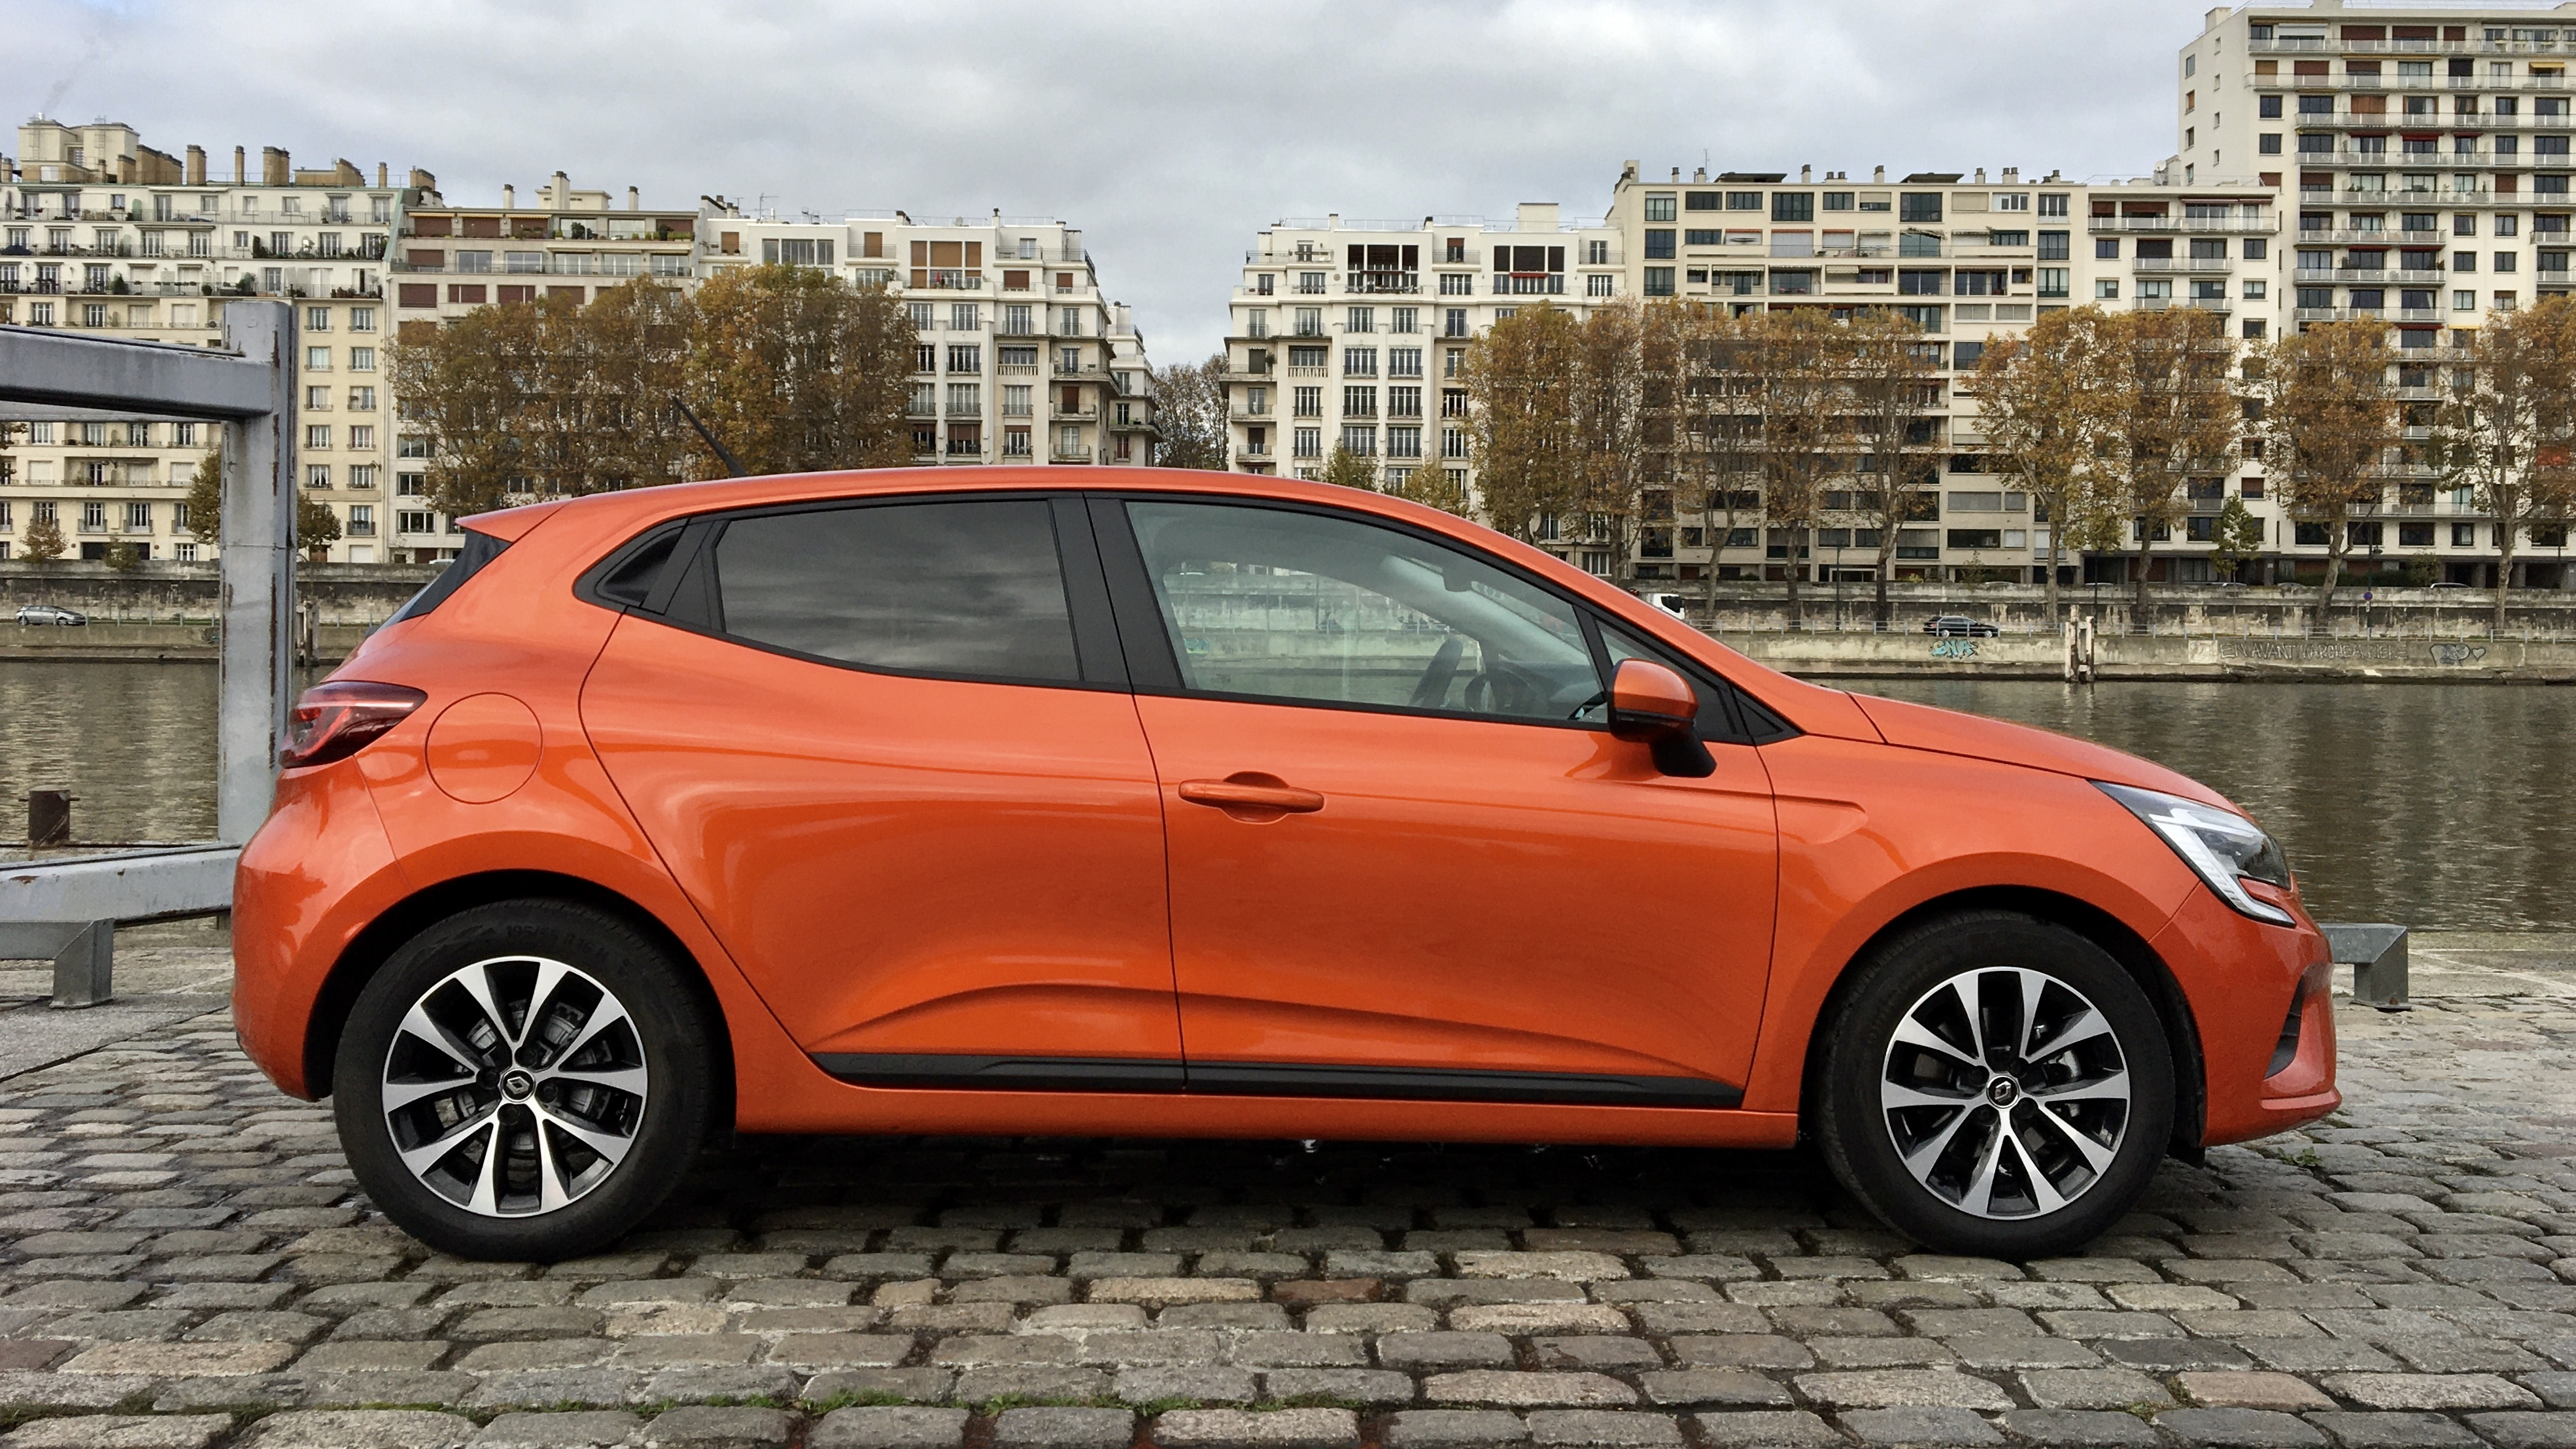 2019 - [Renault] Clio V (BJA) - Page 17 S0-essai-renault-clio-dci-85-611015